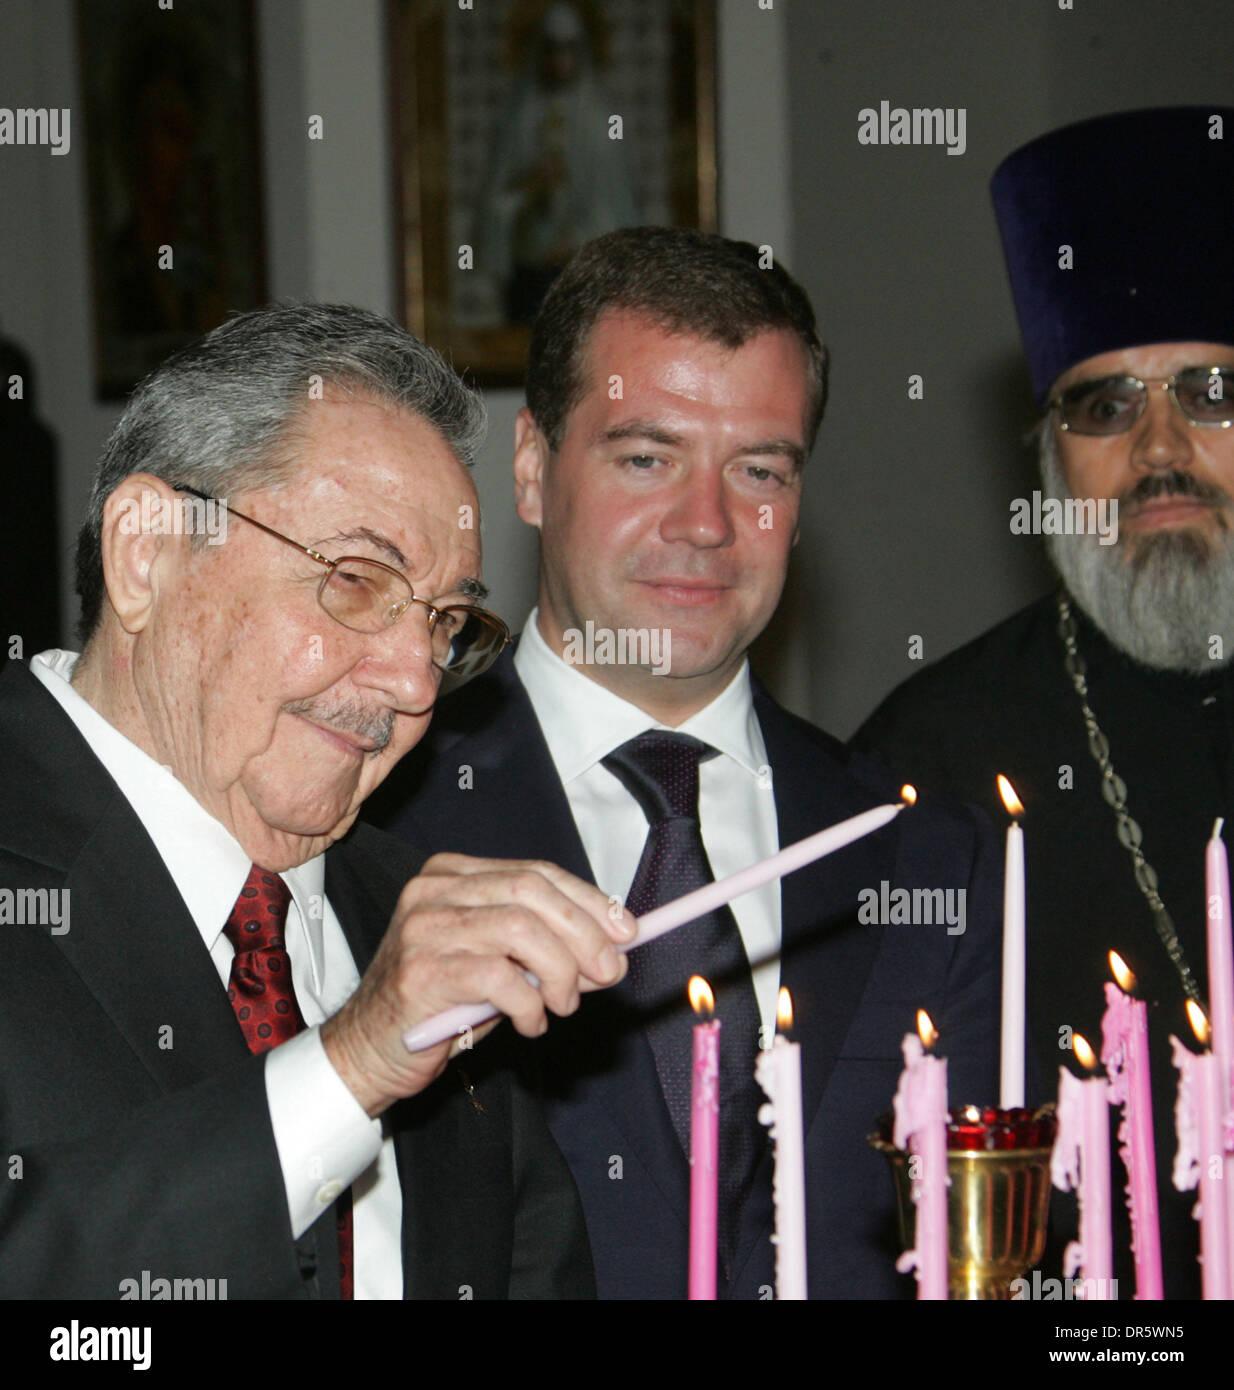 præsident cuba 2008